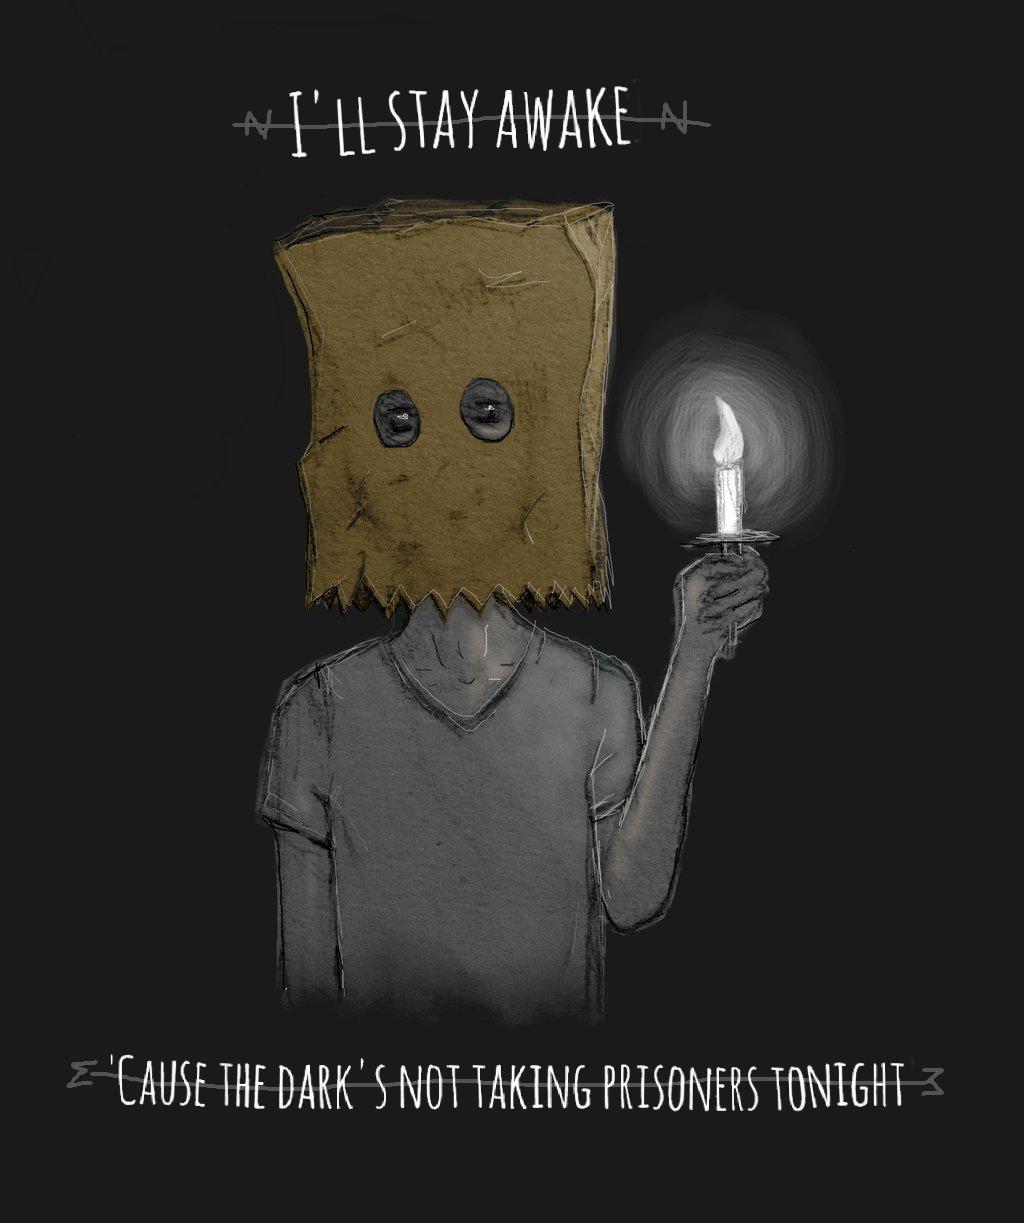 awake by awkwardparanoidkid